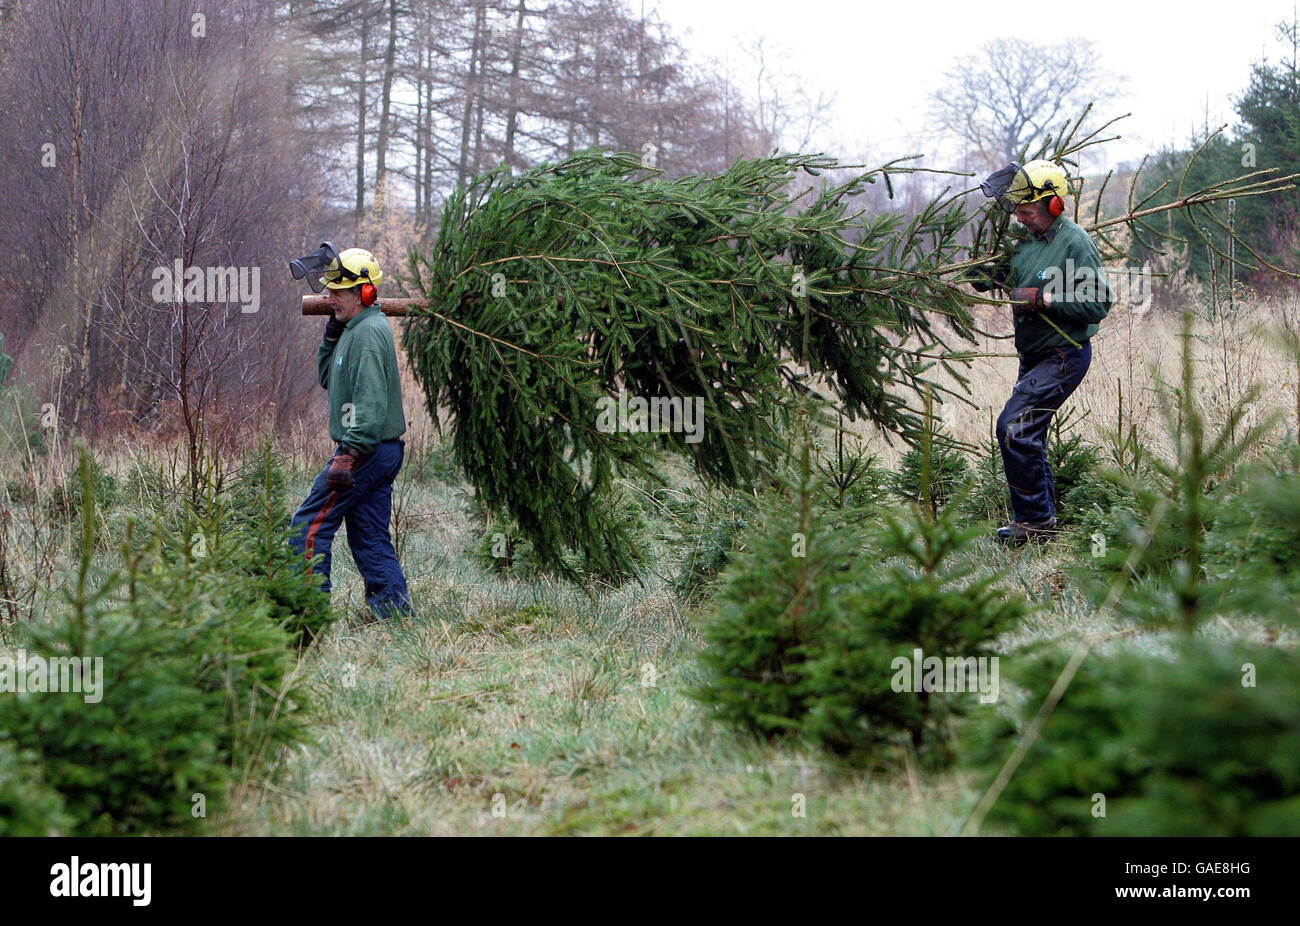 Cut Down Christmas Tree Near Me.Christmas Trees Being Cut Down Stock Photo 109722860 Alamy